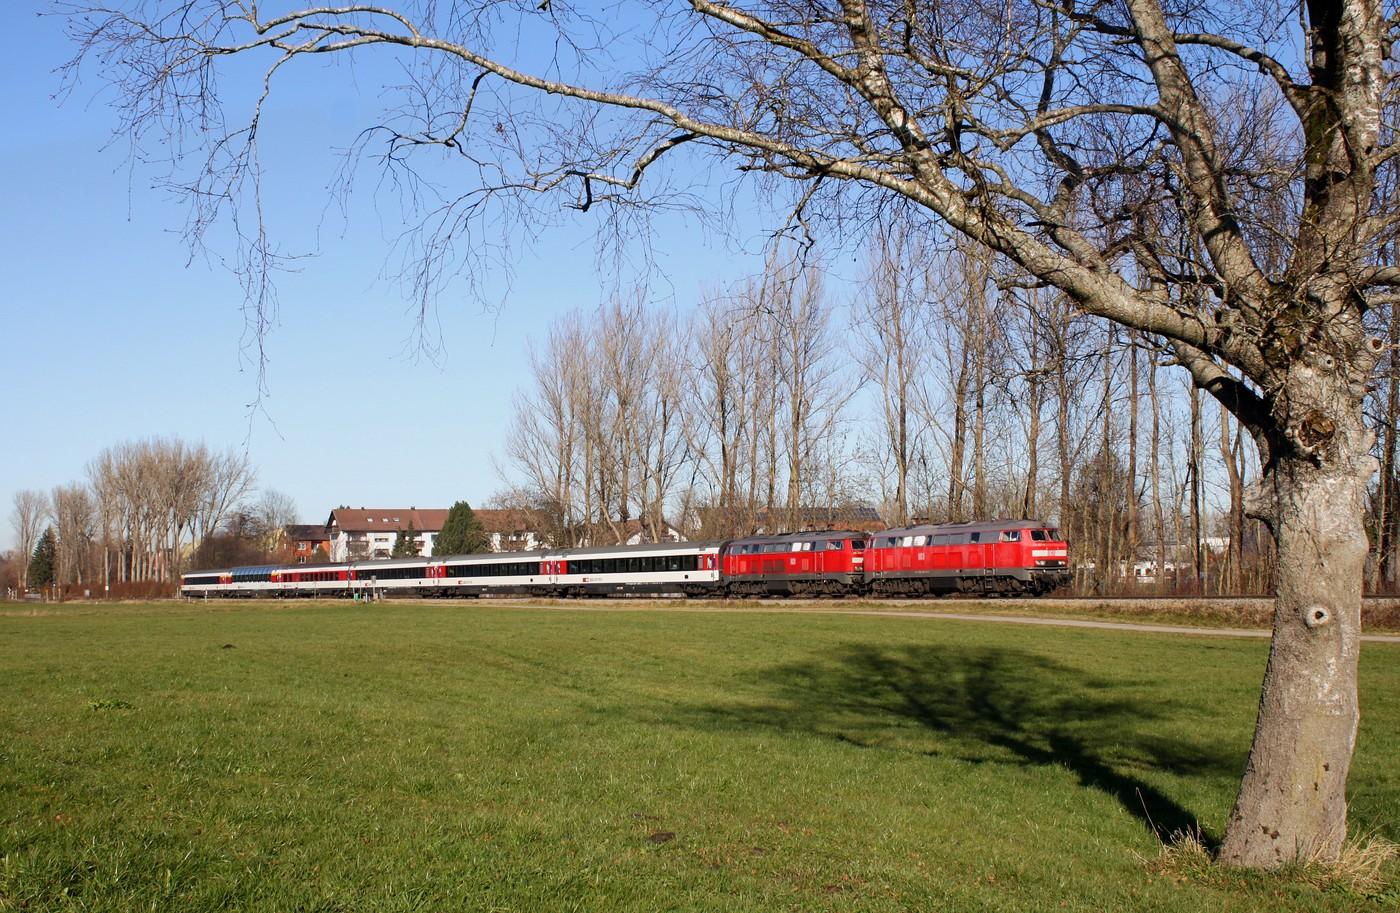 http://www.eisenbahn-im-bild.de/Temp/C_20_Kauf_IMG_8902.jpg